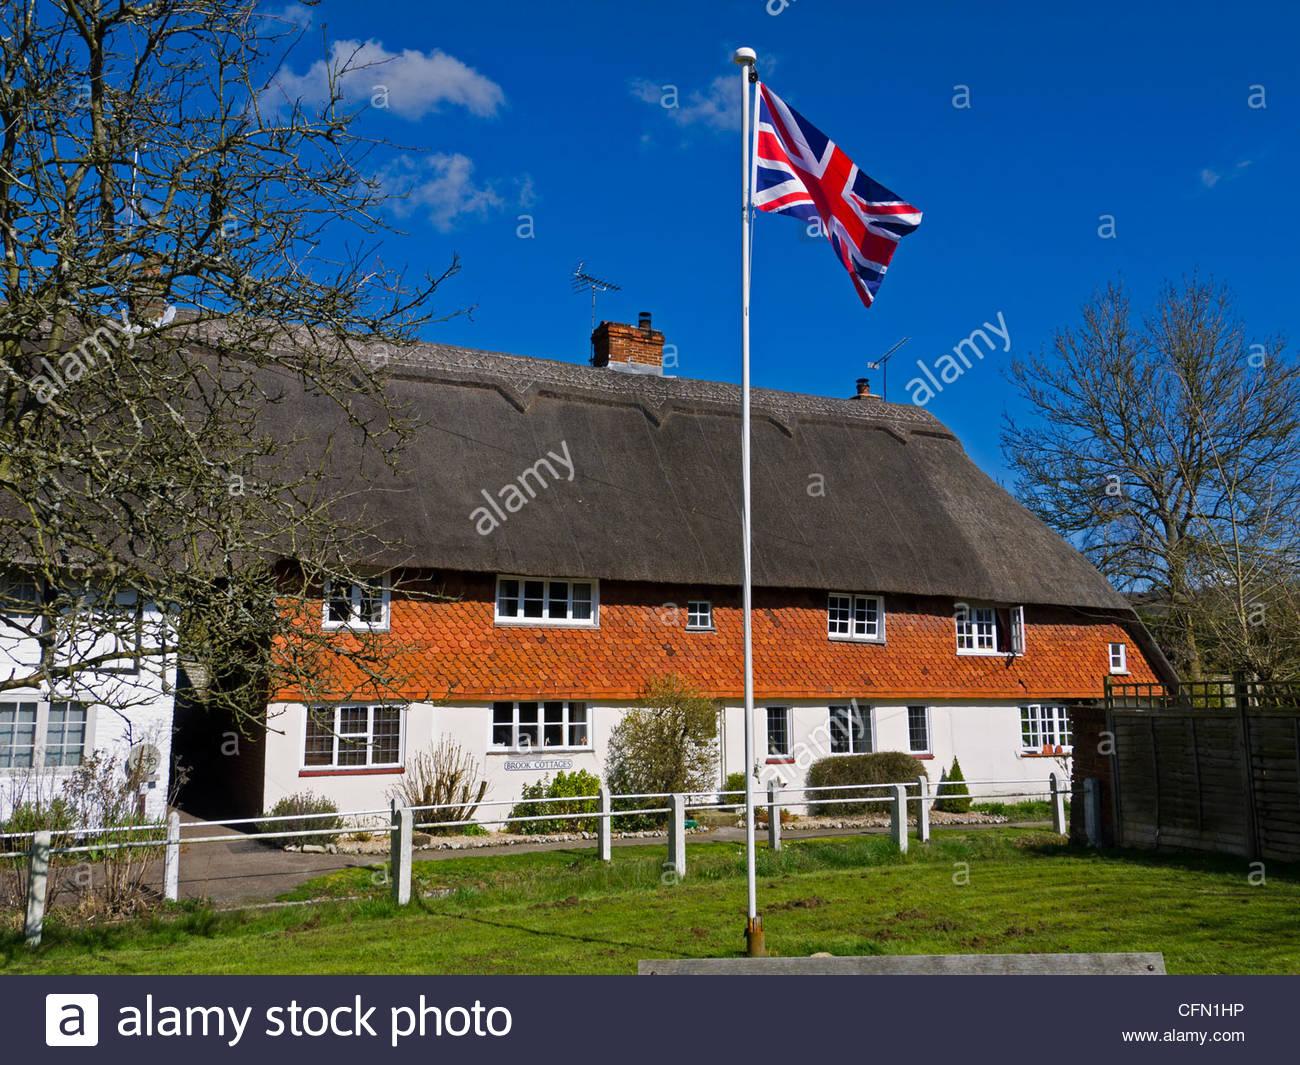 Union Jack Flag and Cottages East Meon Hampshire England UK - Stock Image